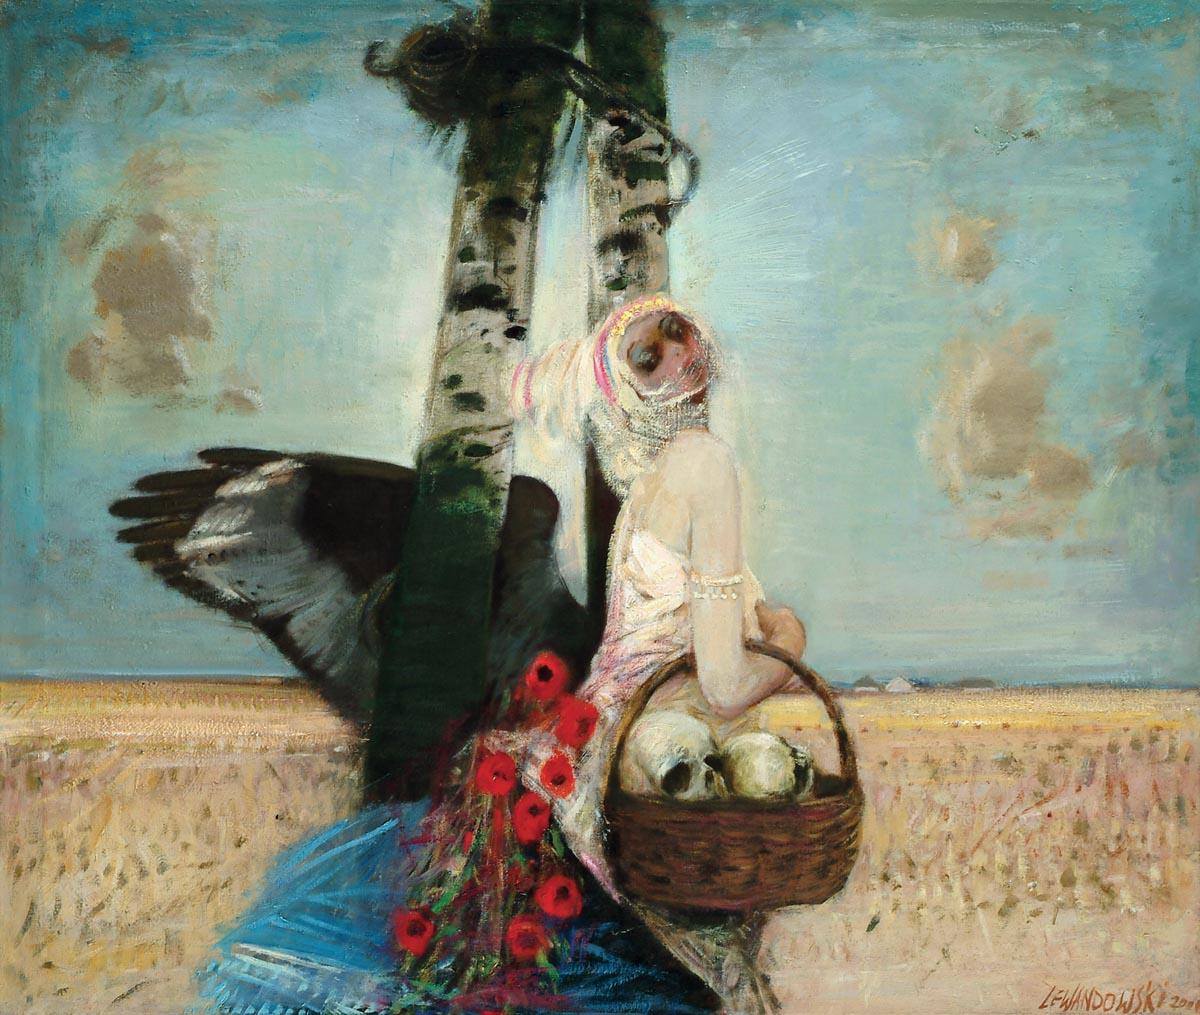 Janusz Lewandowski, obrazy, malarstwo, artysta i sztuka